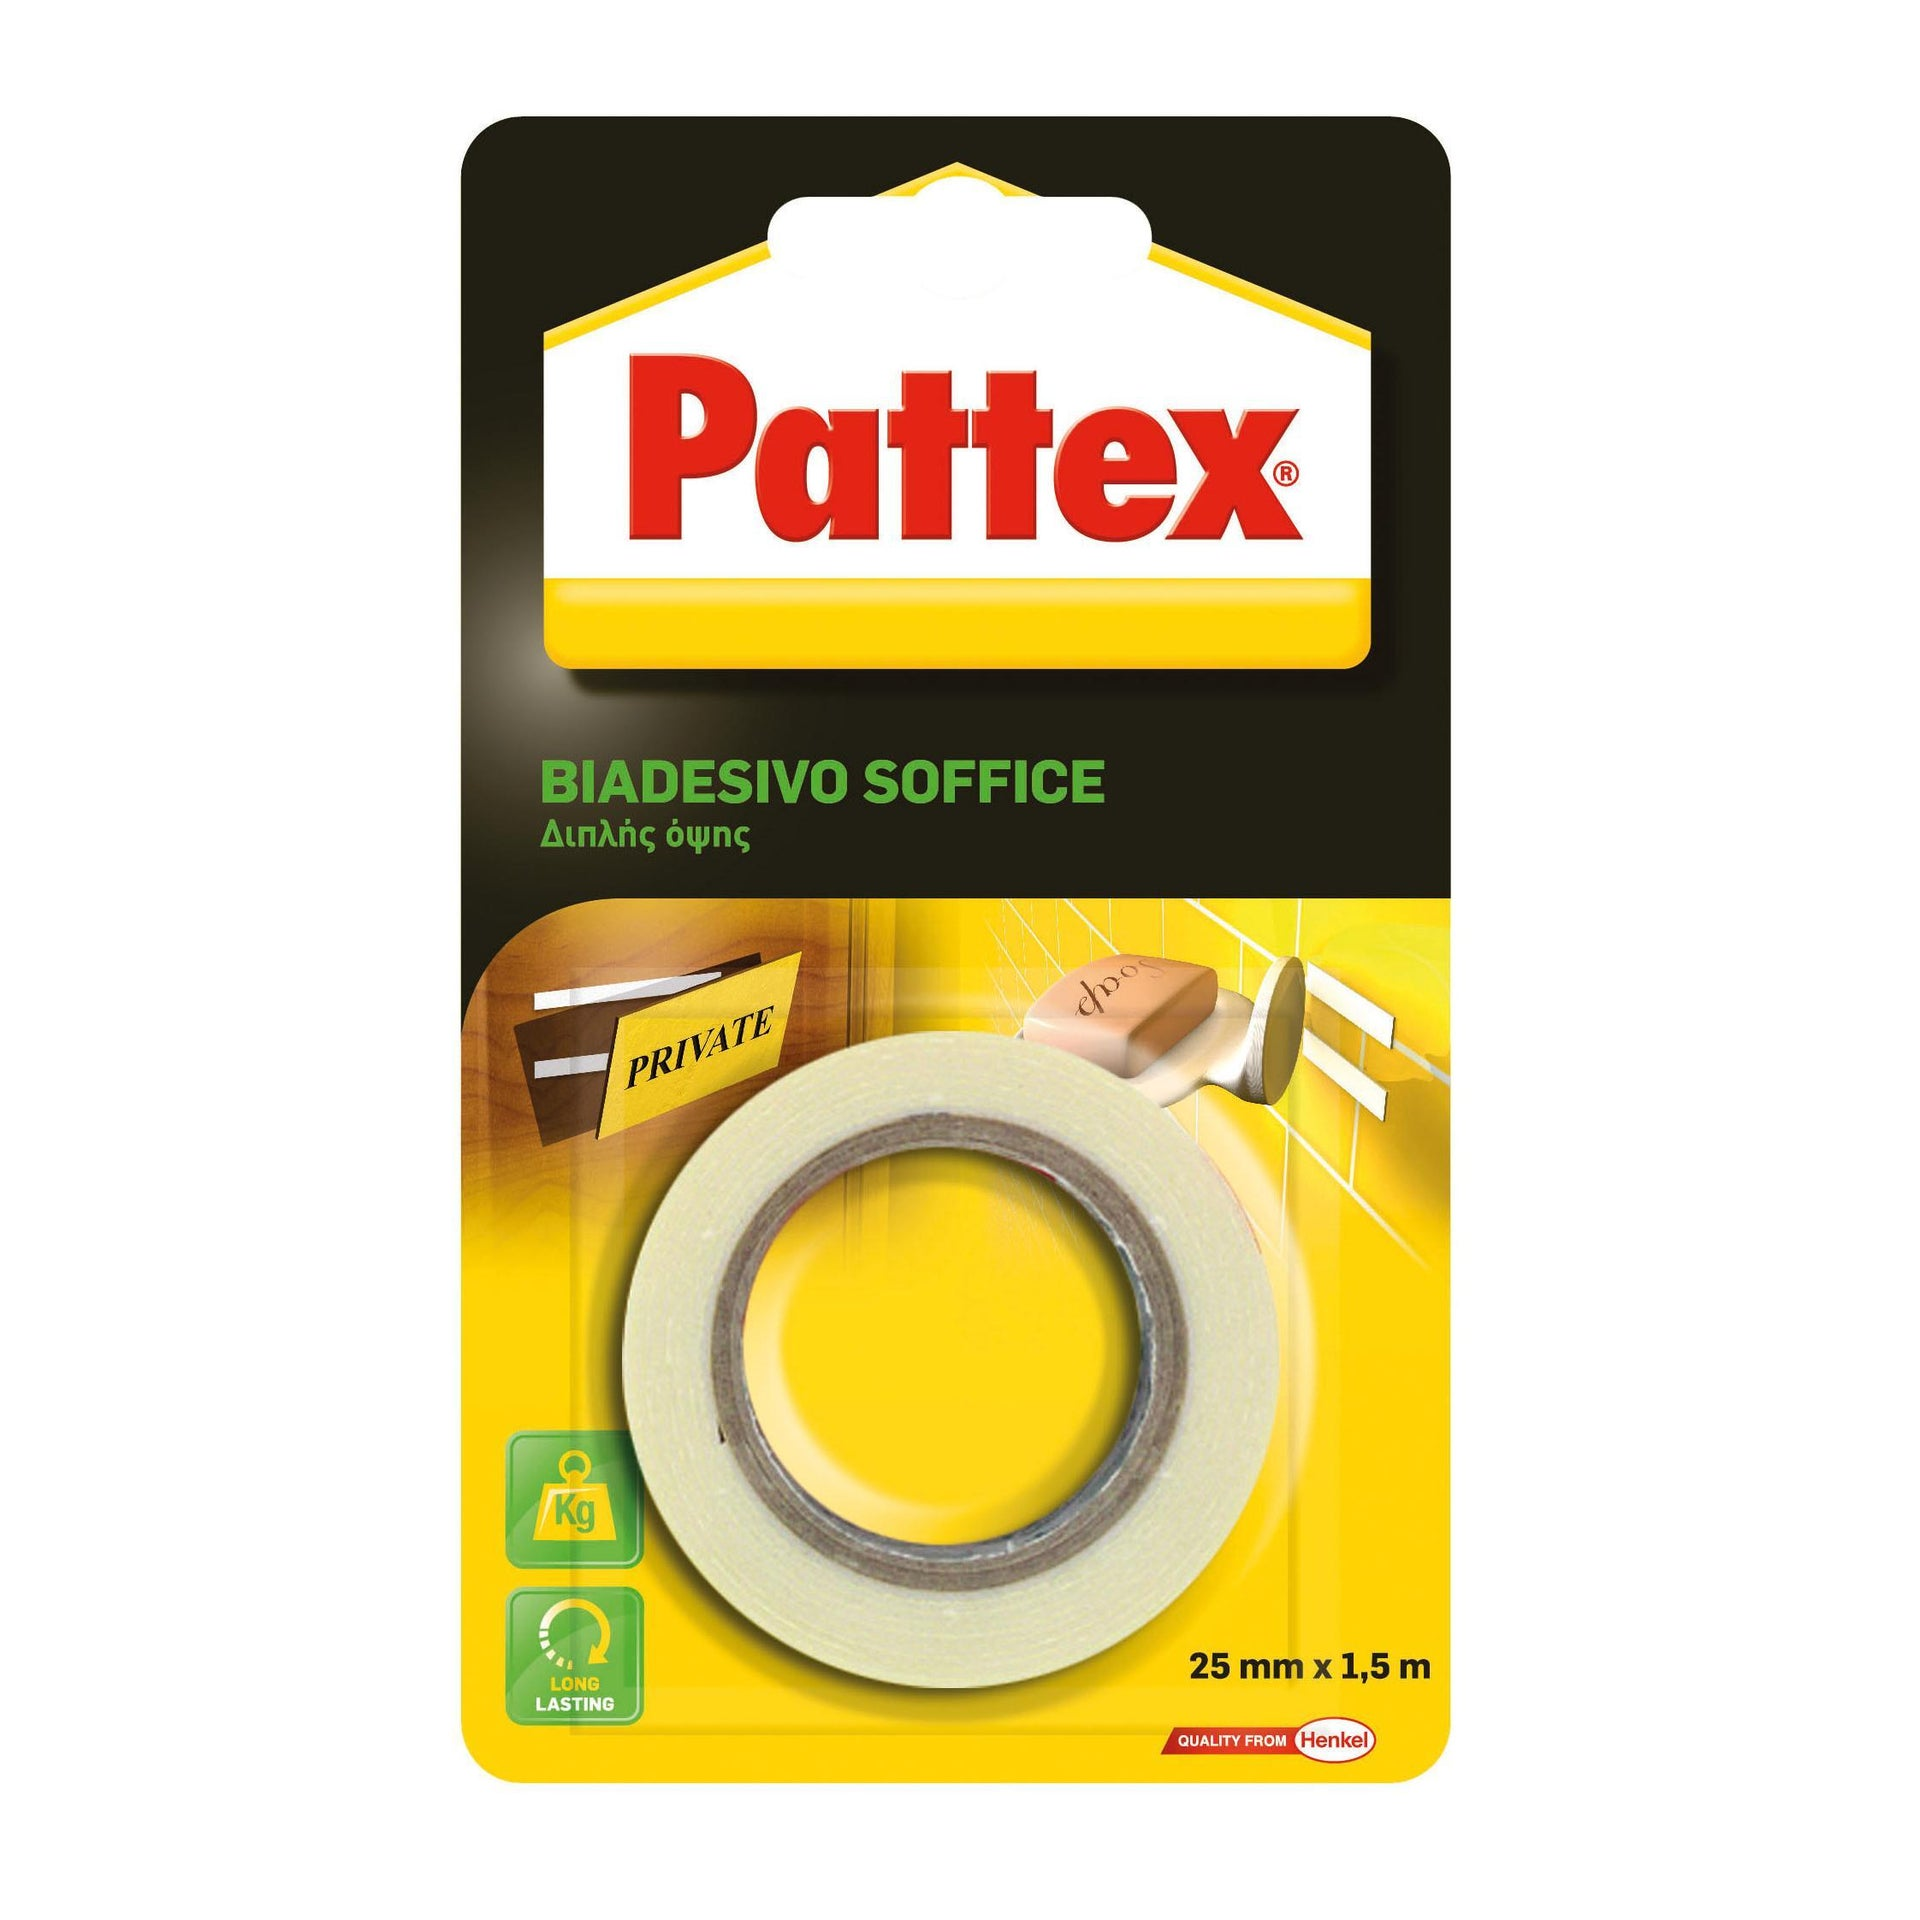 Nastro bi-adesivo PATTEX Biadesivo Soffice 1.5 m x 25 mm bianco